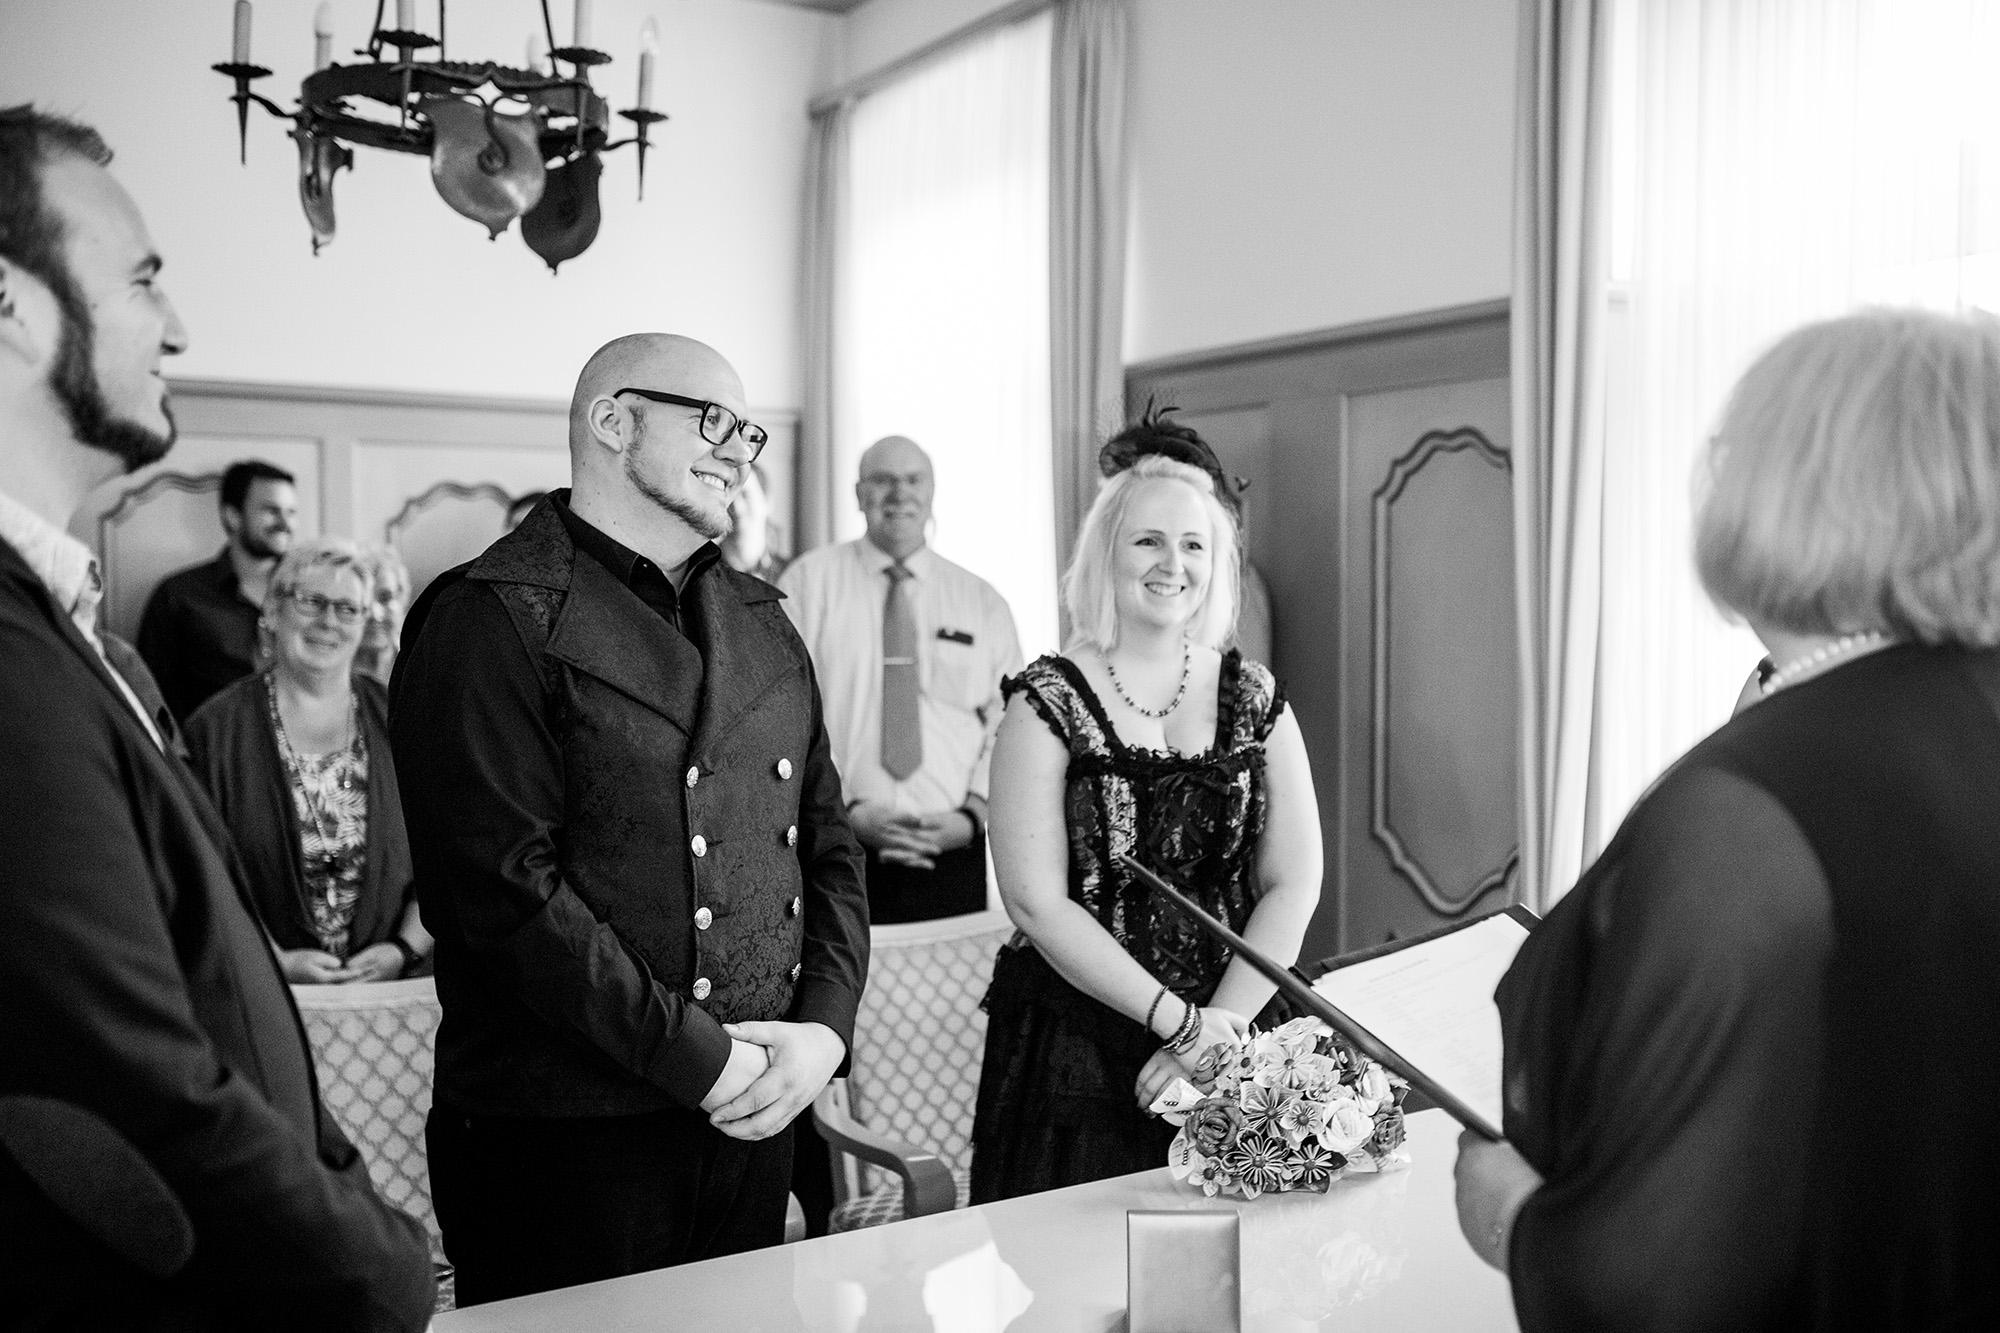 Seriously_Sabrina_Photography_Essen_Germany_RocknRoll_Hochzeit_Wedding_PatrickJenny33.jpg